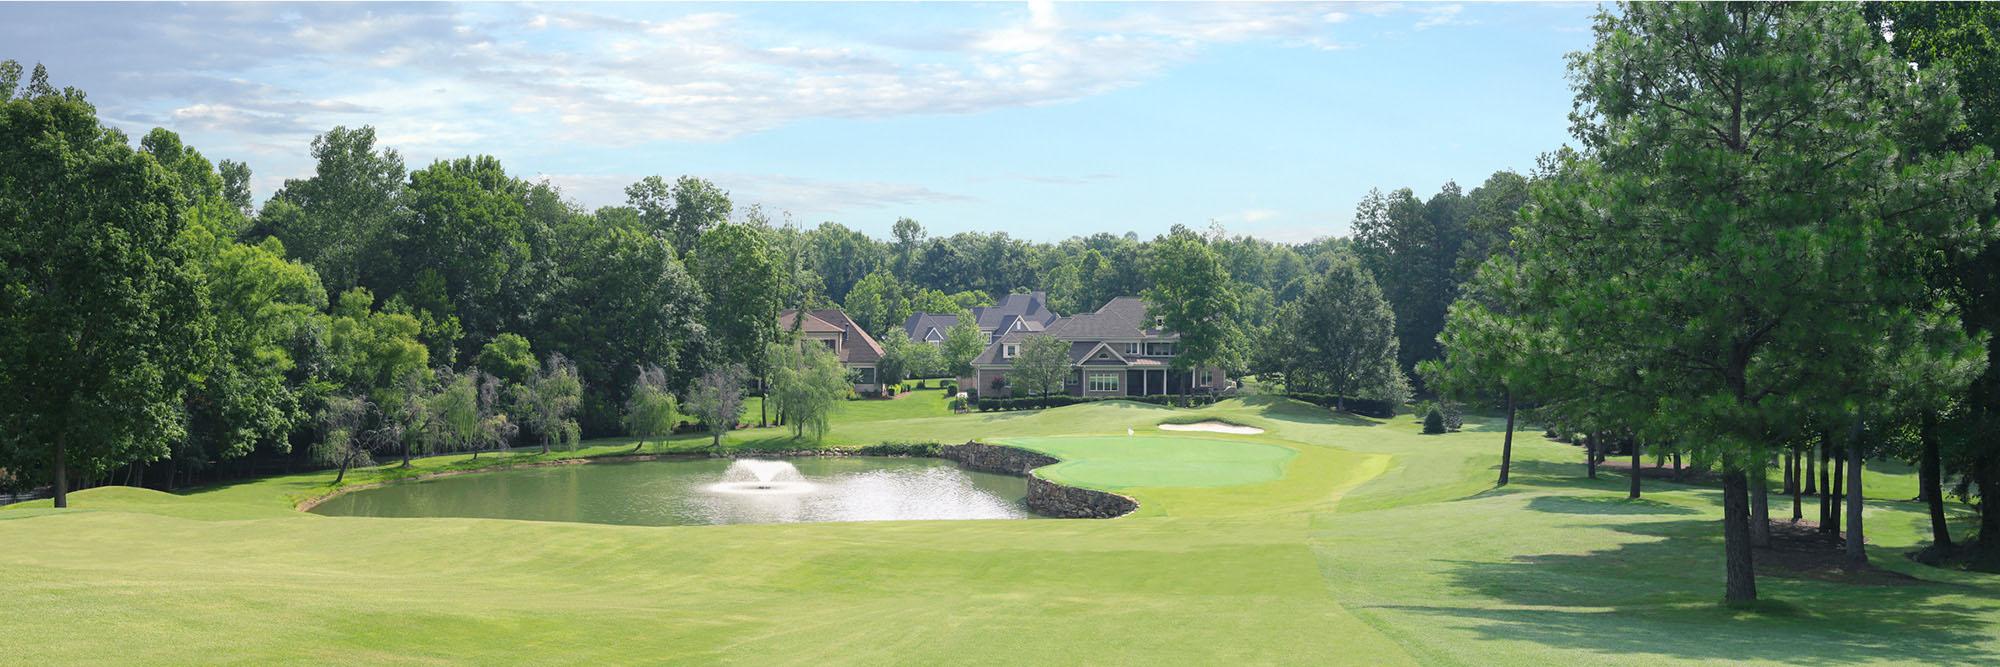 Golf Course Image - River Run Country Club No. 12